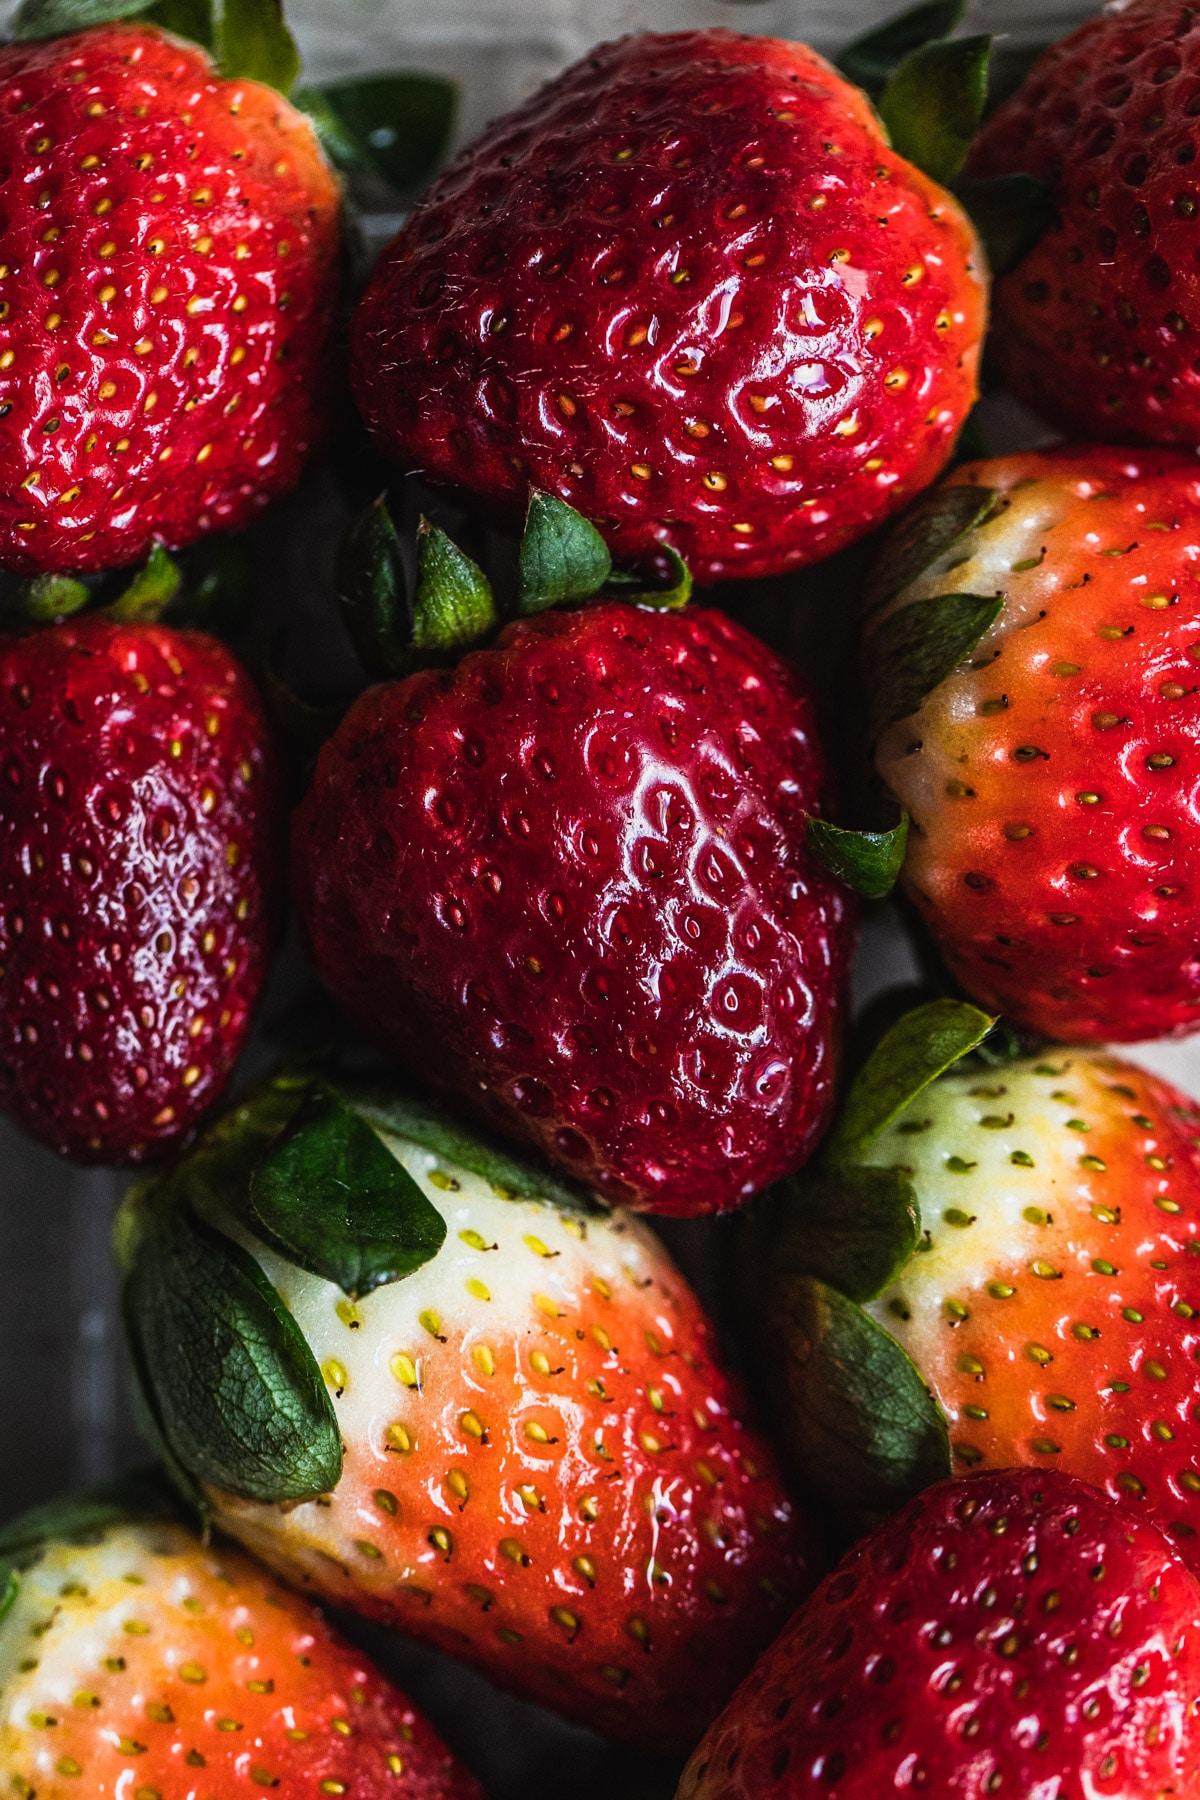 macro image of strawberries